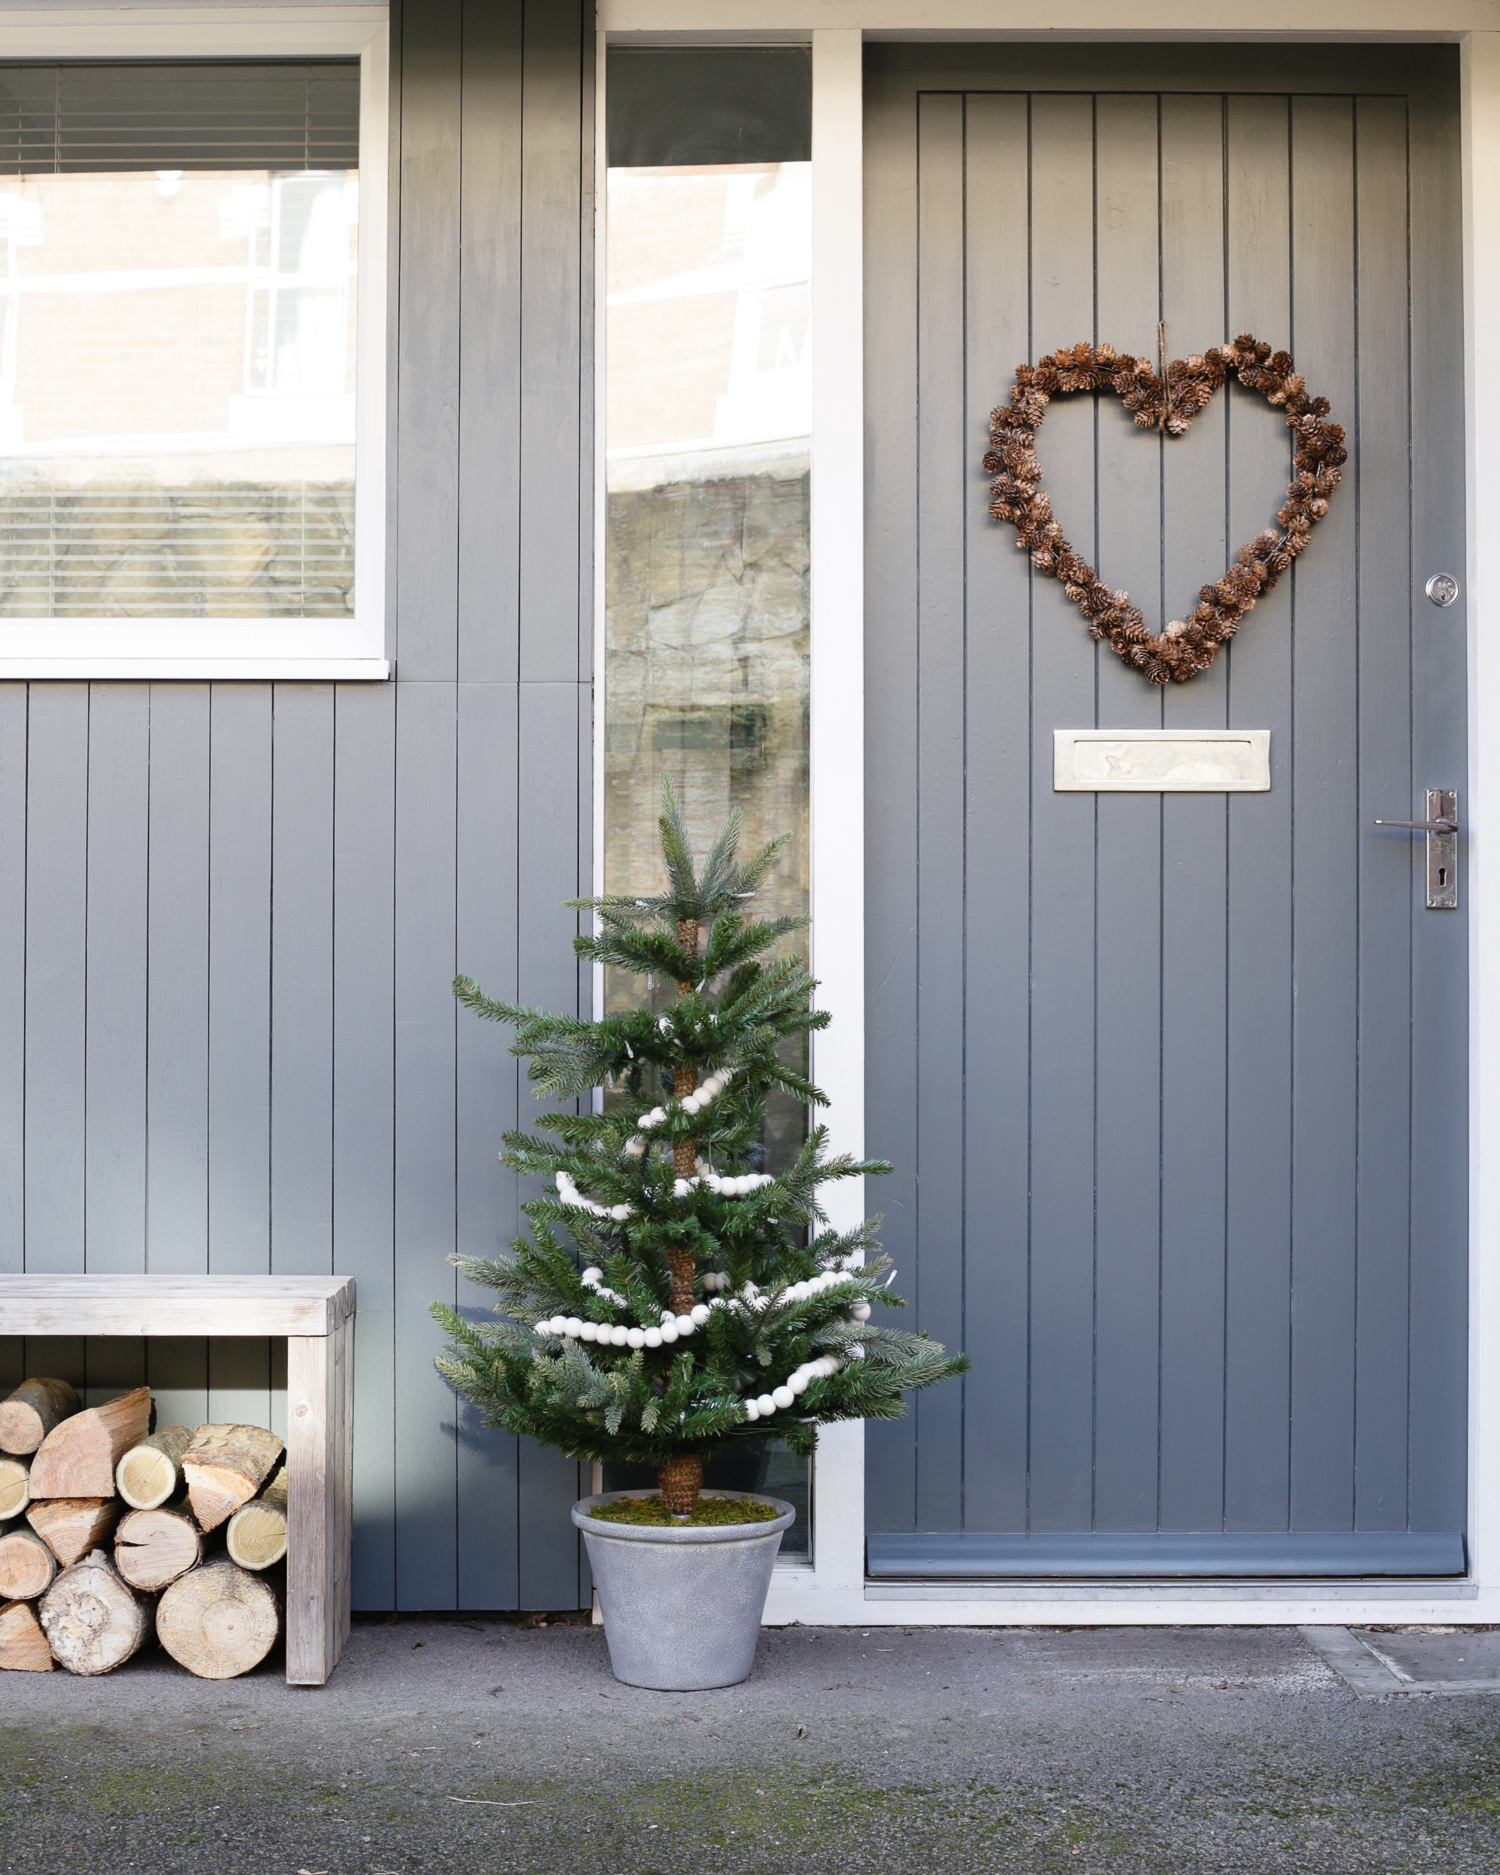 Festive door wreath and Christmas tree | Design Hunter